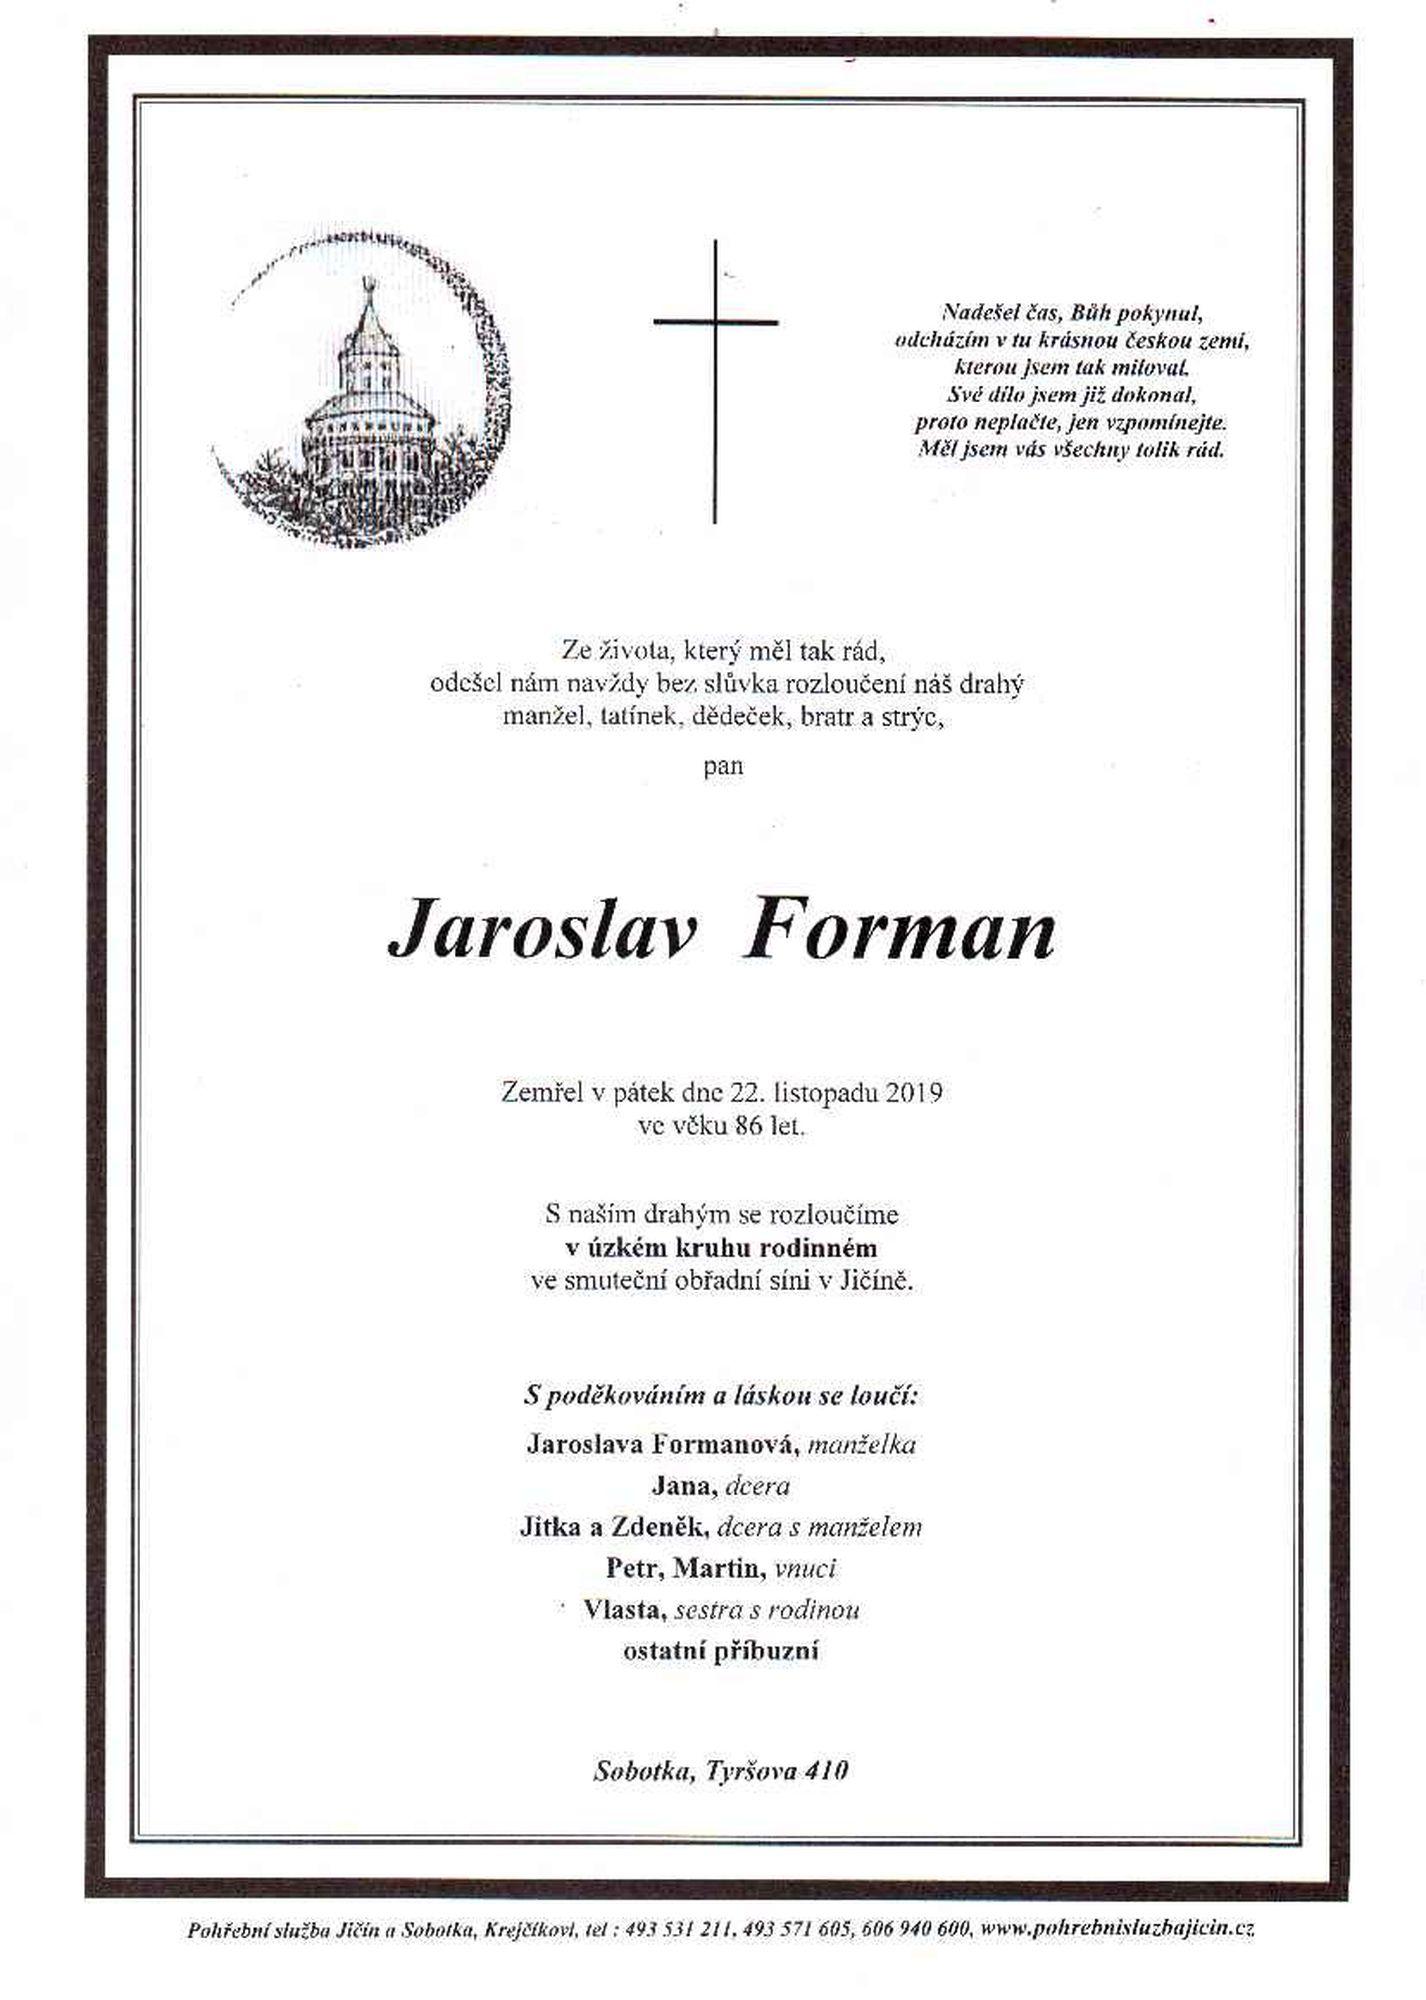 Jaroslav Forman